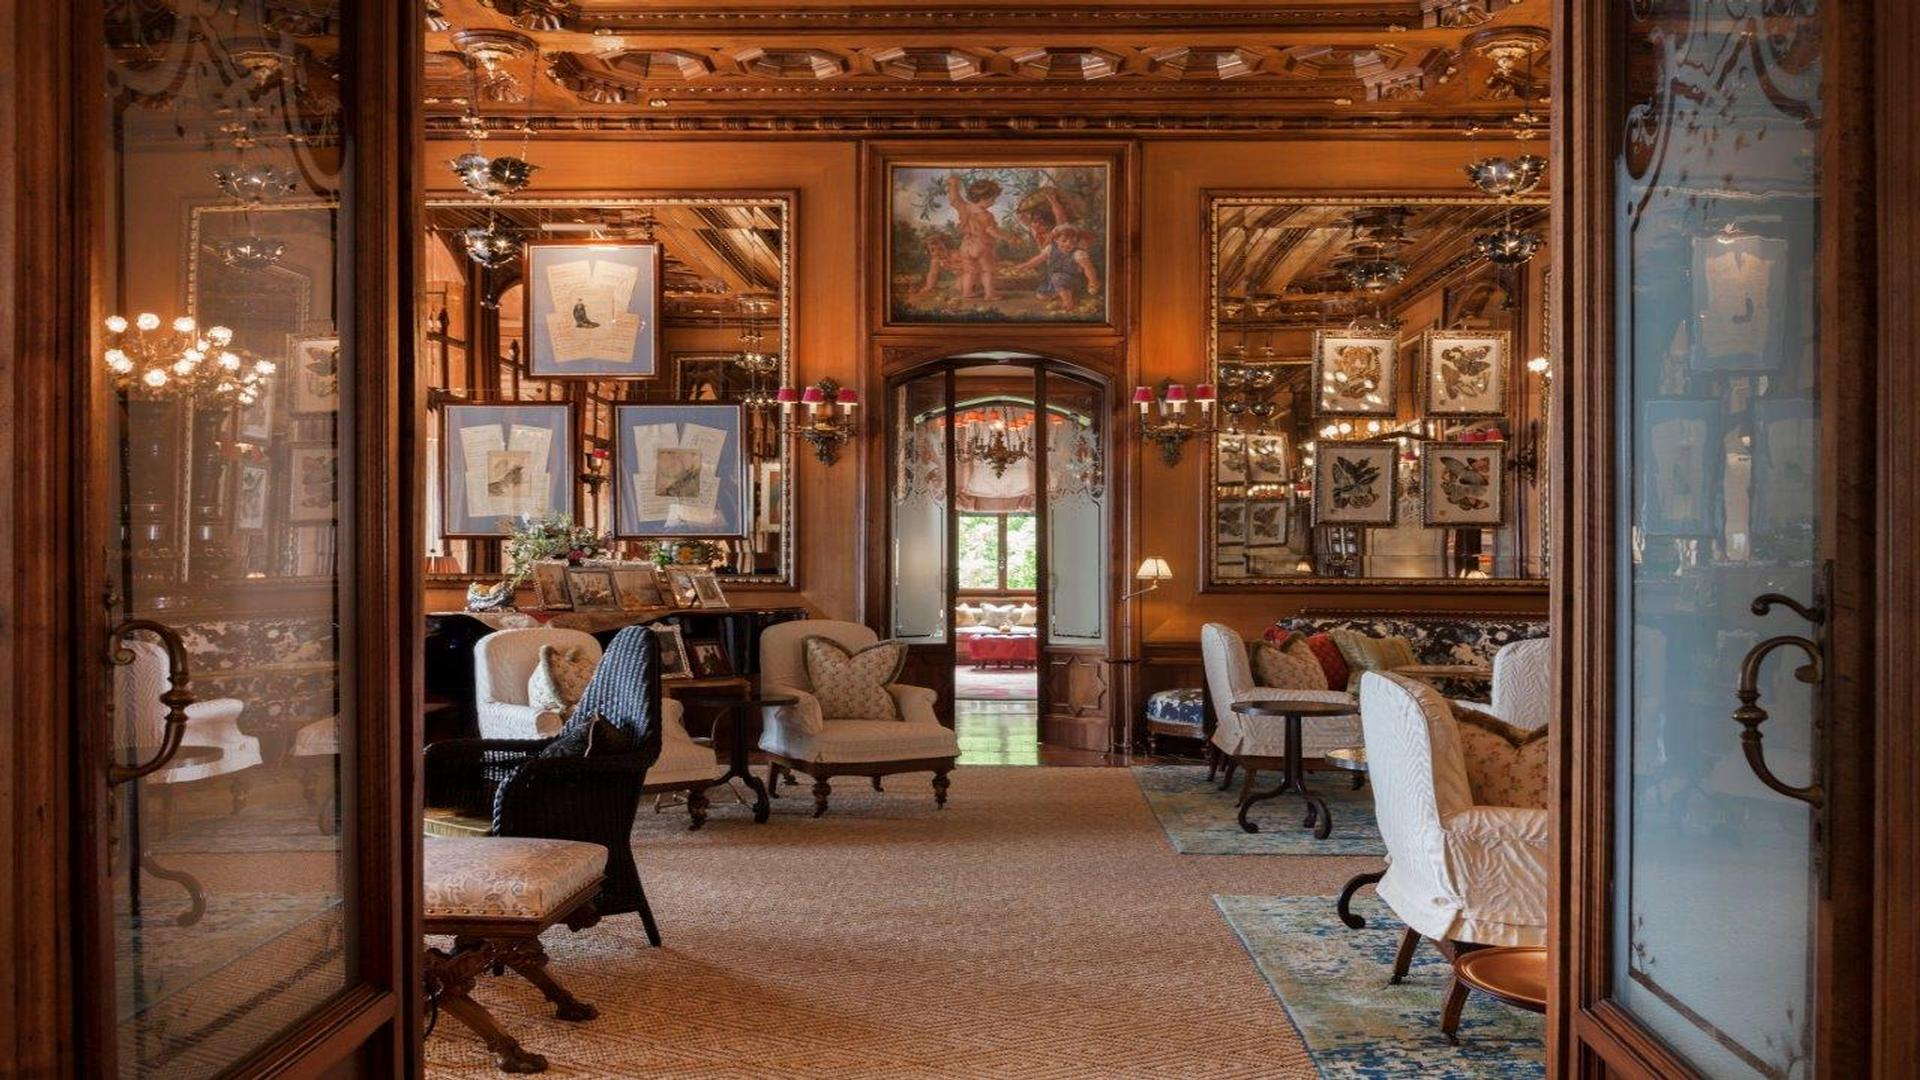 Grand Hotel à Villa Feltrinelli